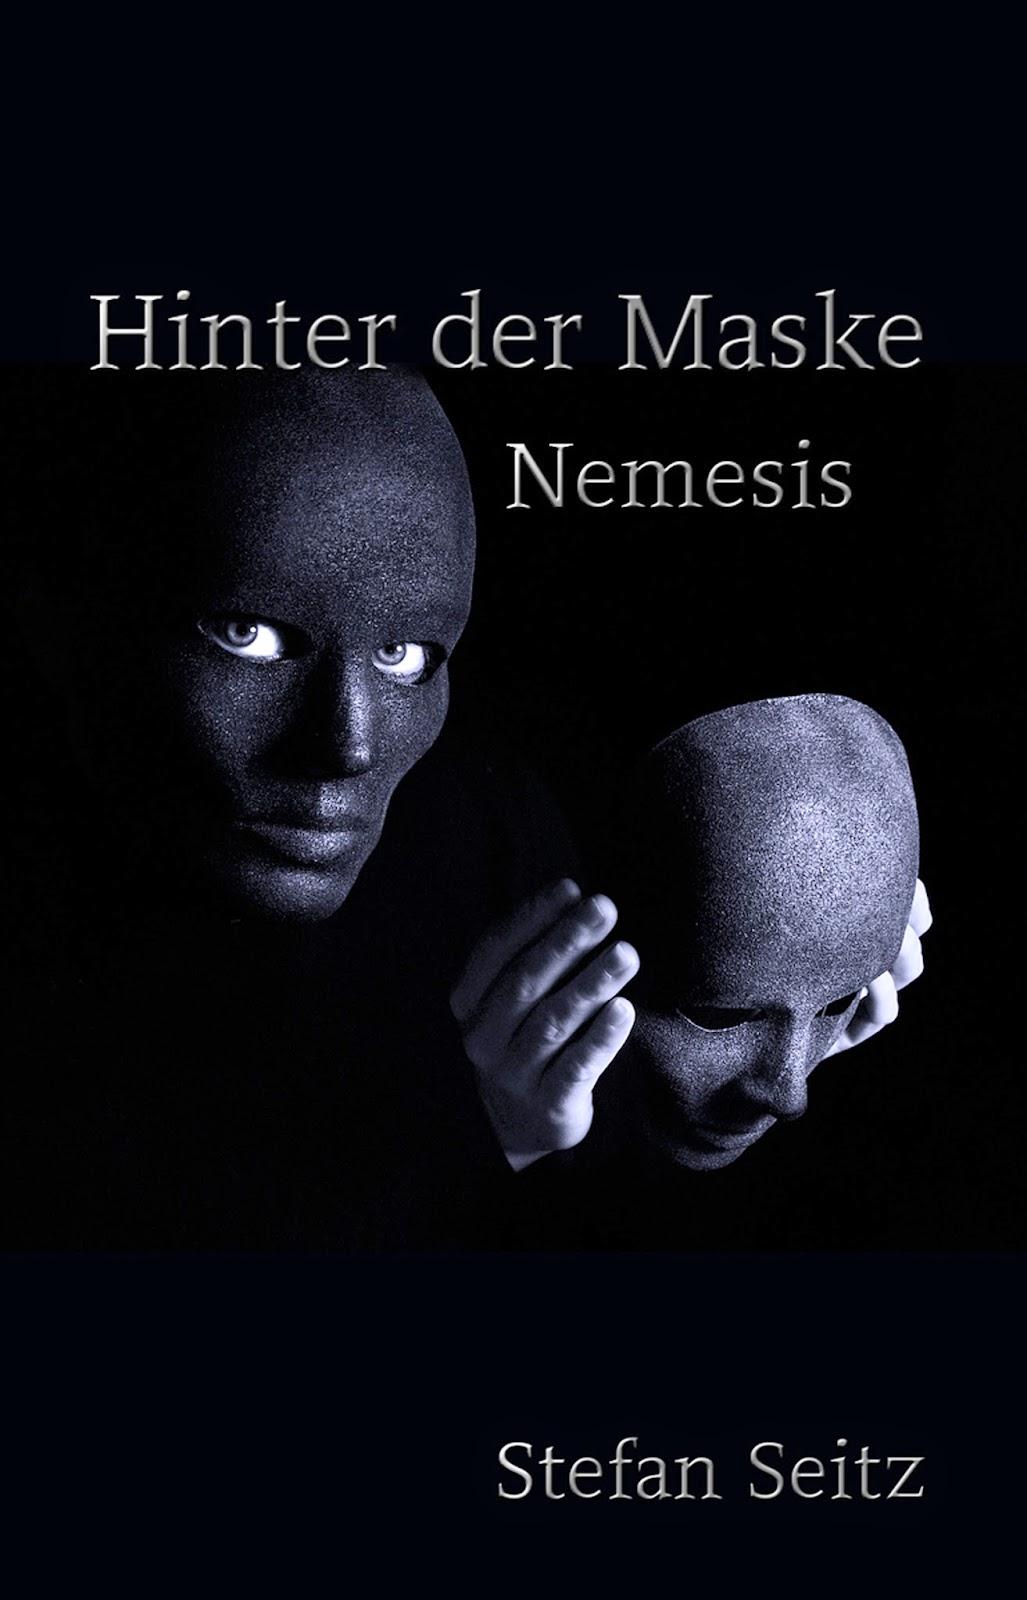 http://www.amazon.de/Hinter-Maske-Nemesis-Stefan-Seitz-ebook/dp/B00RPP0576/ref=as_sl_pc_tf_ssw?&linkCode=wss&tag=wwwlektoratps-21